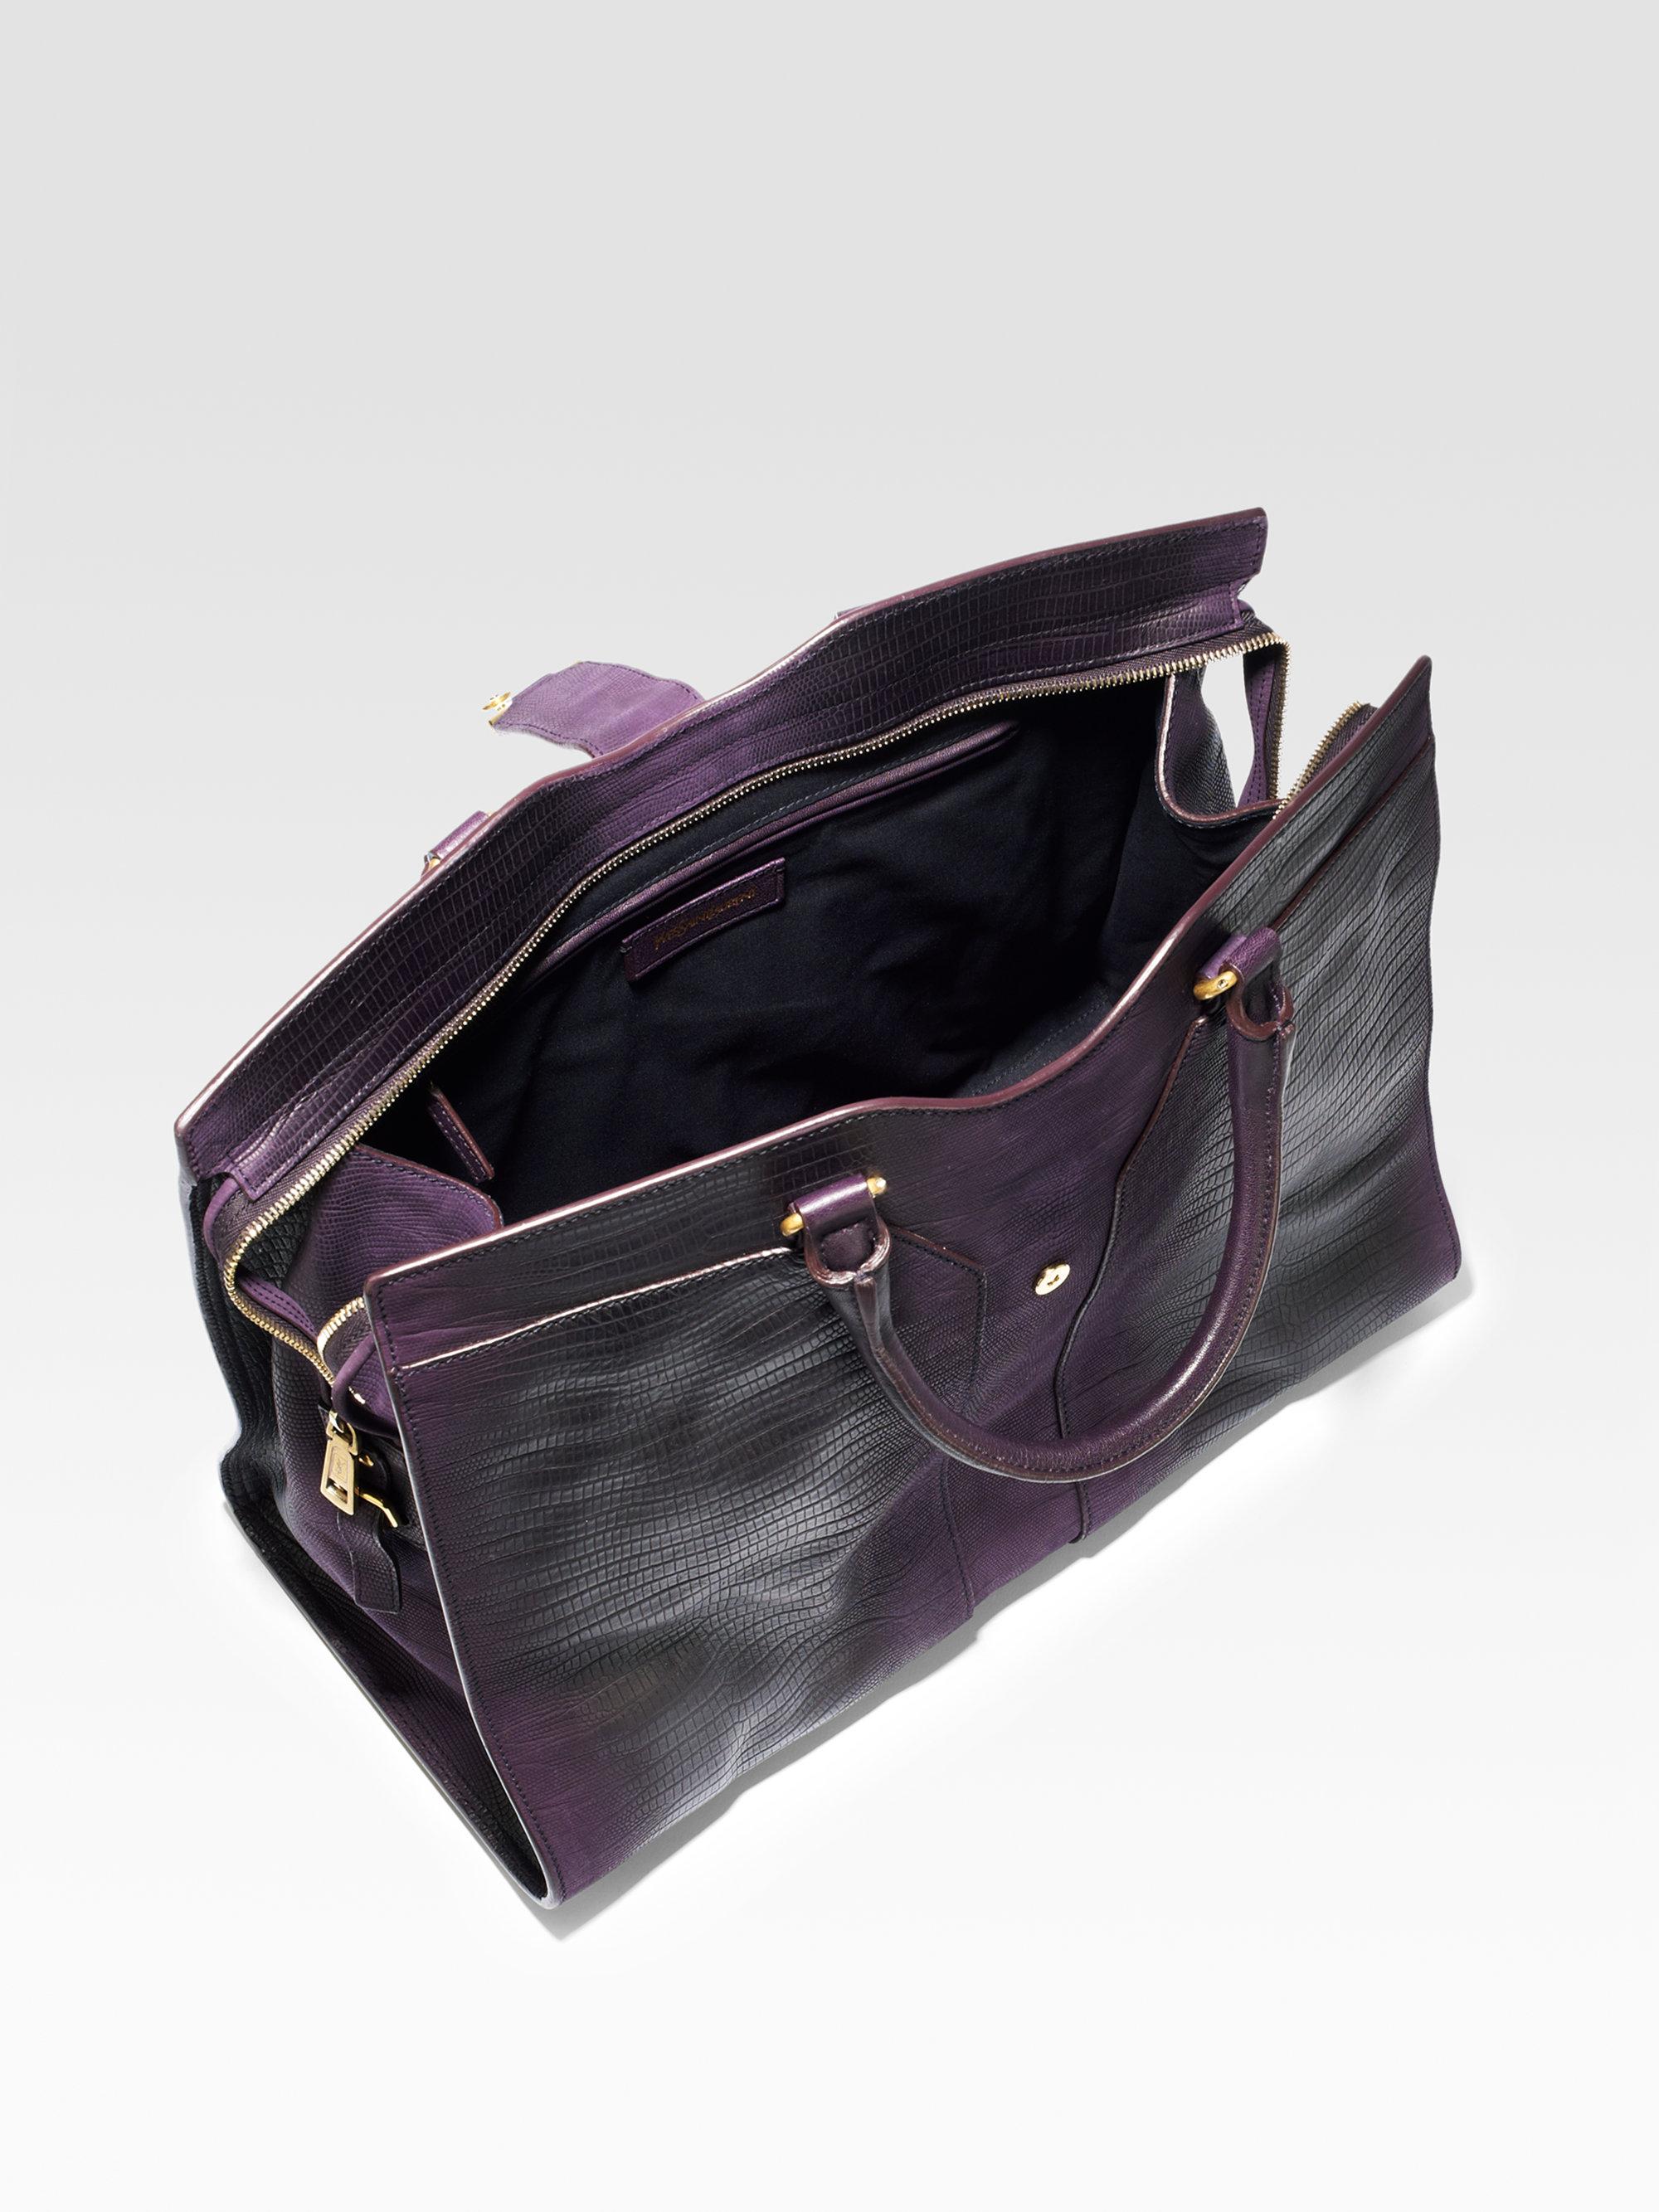 ysl medium chyc shoulder bag - Saint laurent Ysl Cabas Chyc Lizard Embossed Leather Top Handle ...